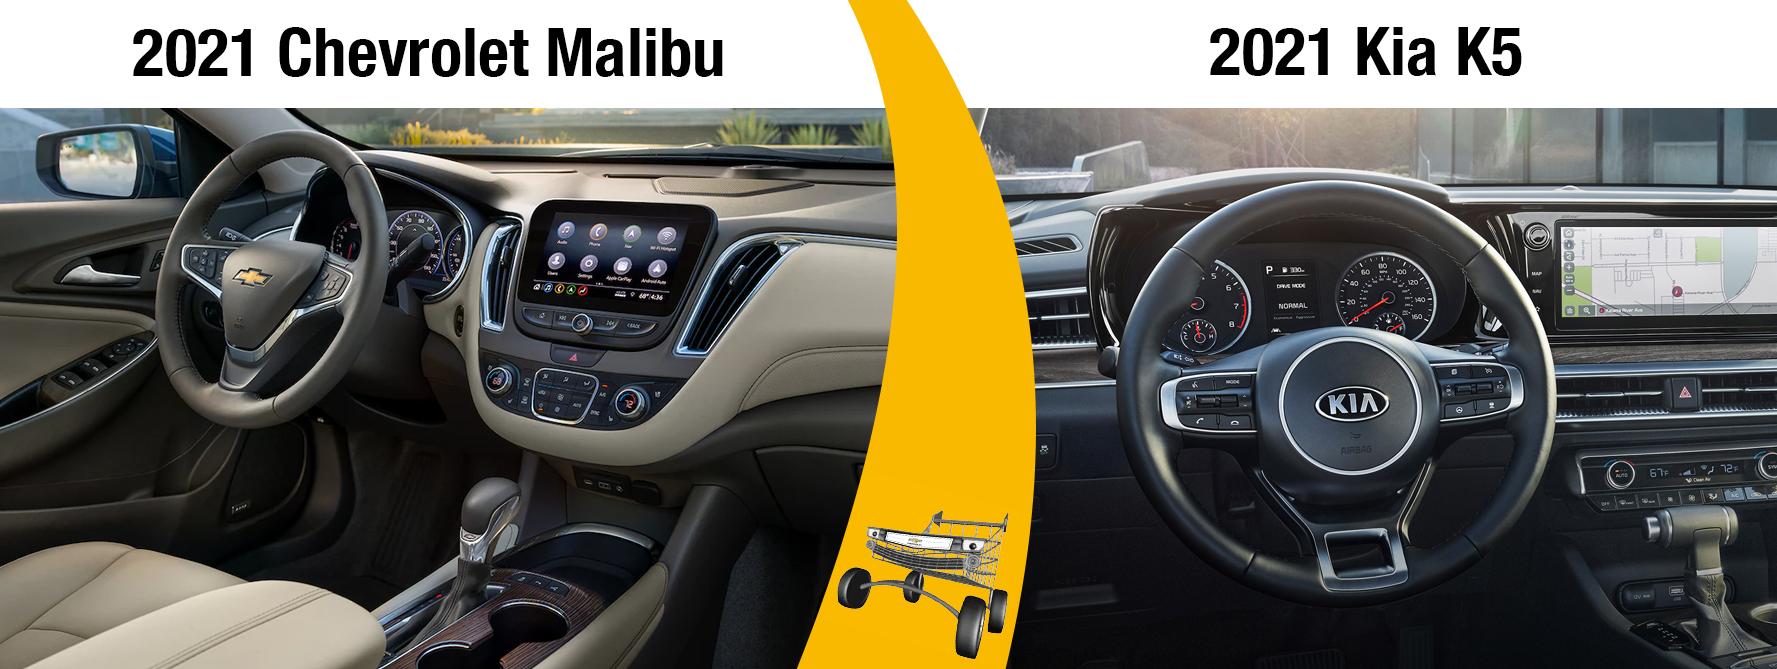 2021 Chevy Malibu vs 2021 Kia K5 Interior